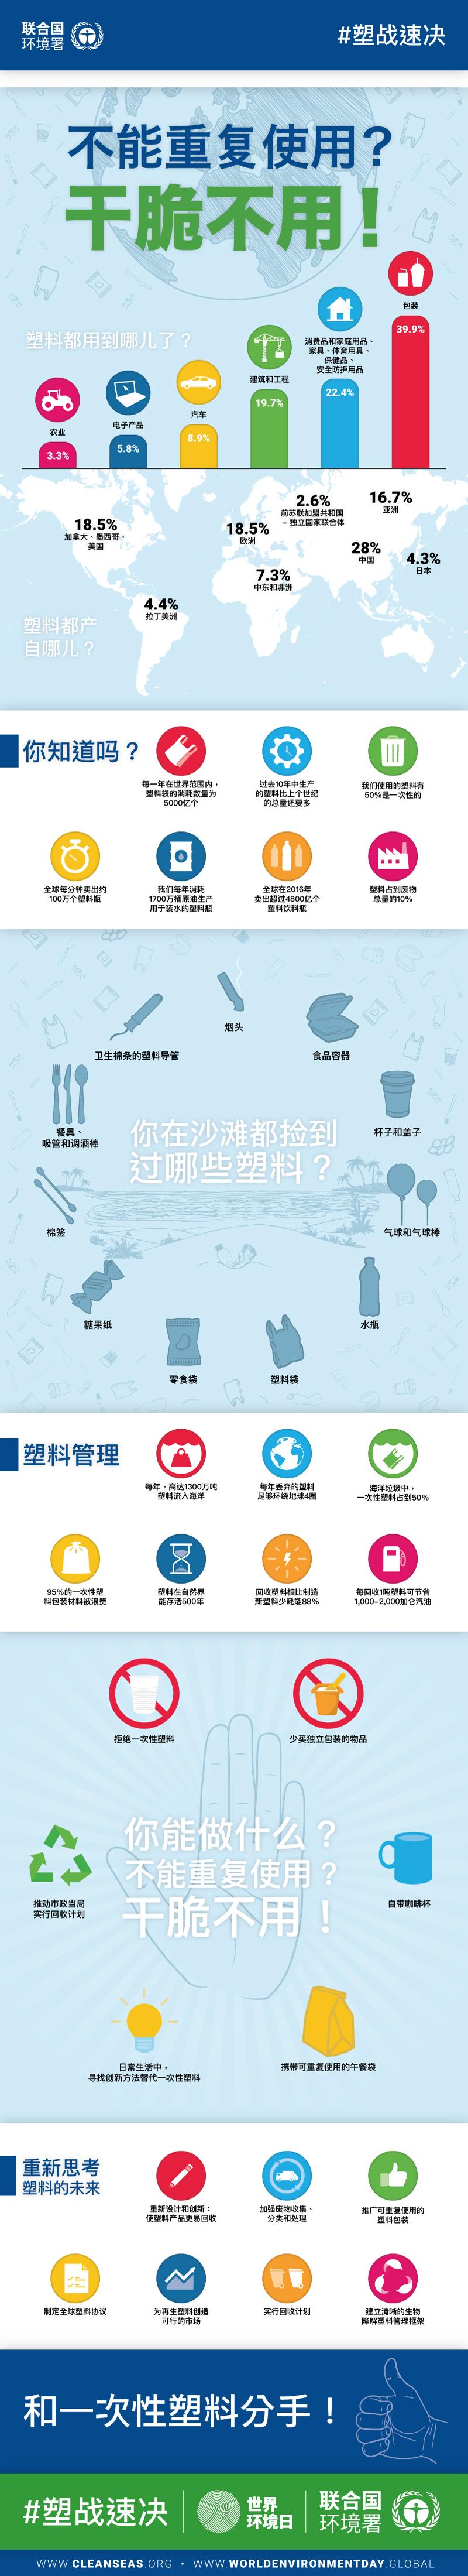 ZH_PLASTIC_infographic.jpg